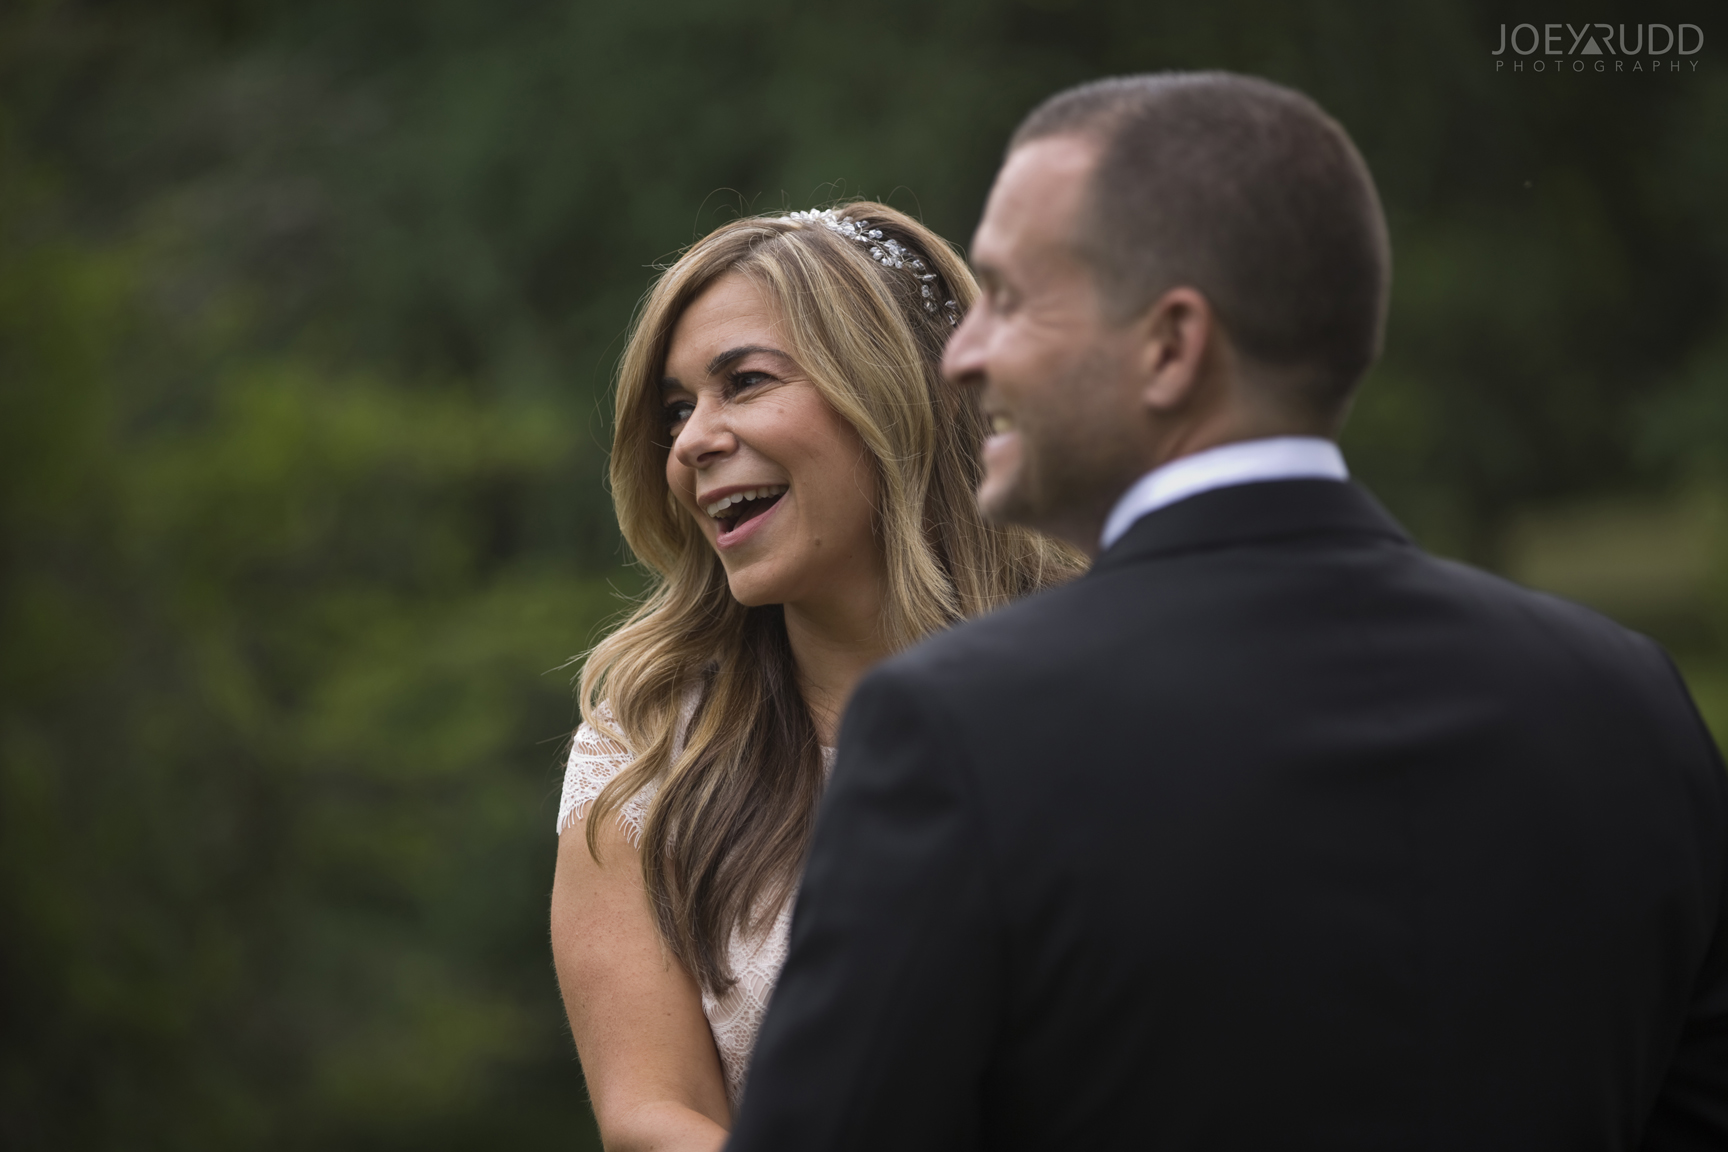 Elopement Wedding by Ottawa Wedding Photographer Joey Rudd Photography Arboretum Bride